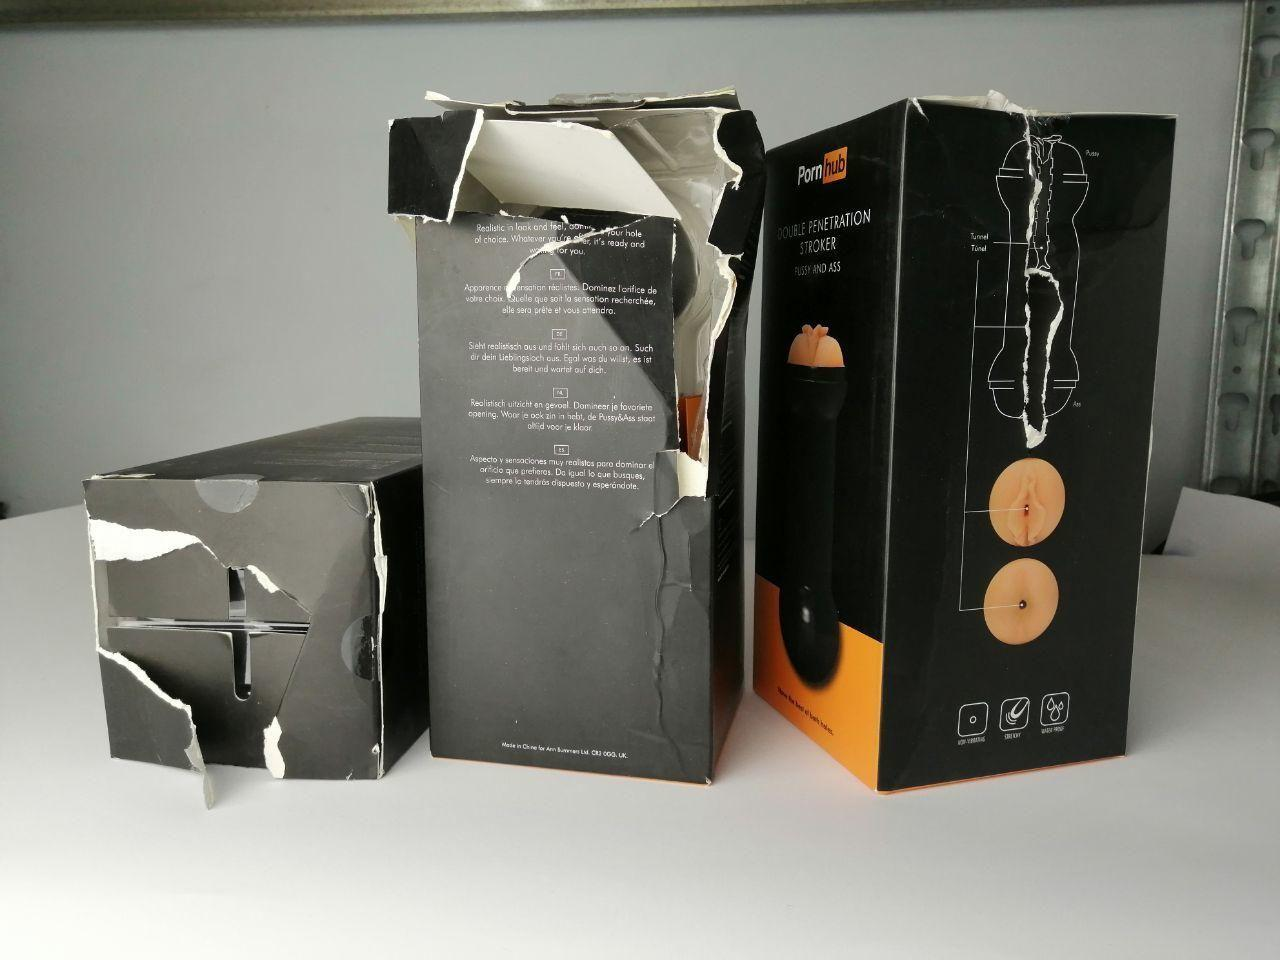 Мастурбатор Pornhub Double Penetration Stroker (испорченная упаковка) SO3123-R